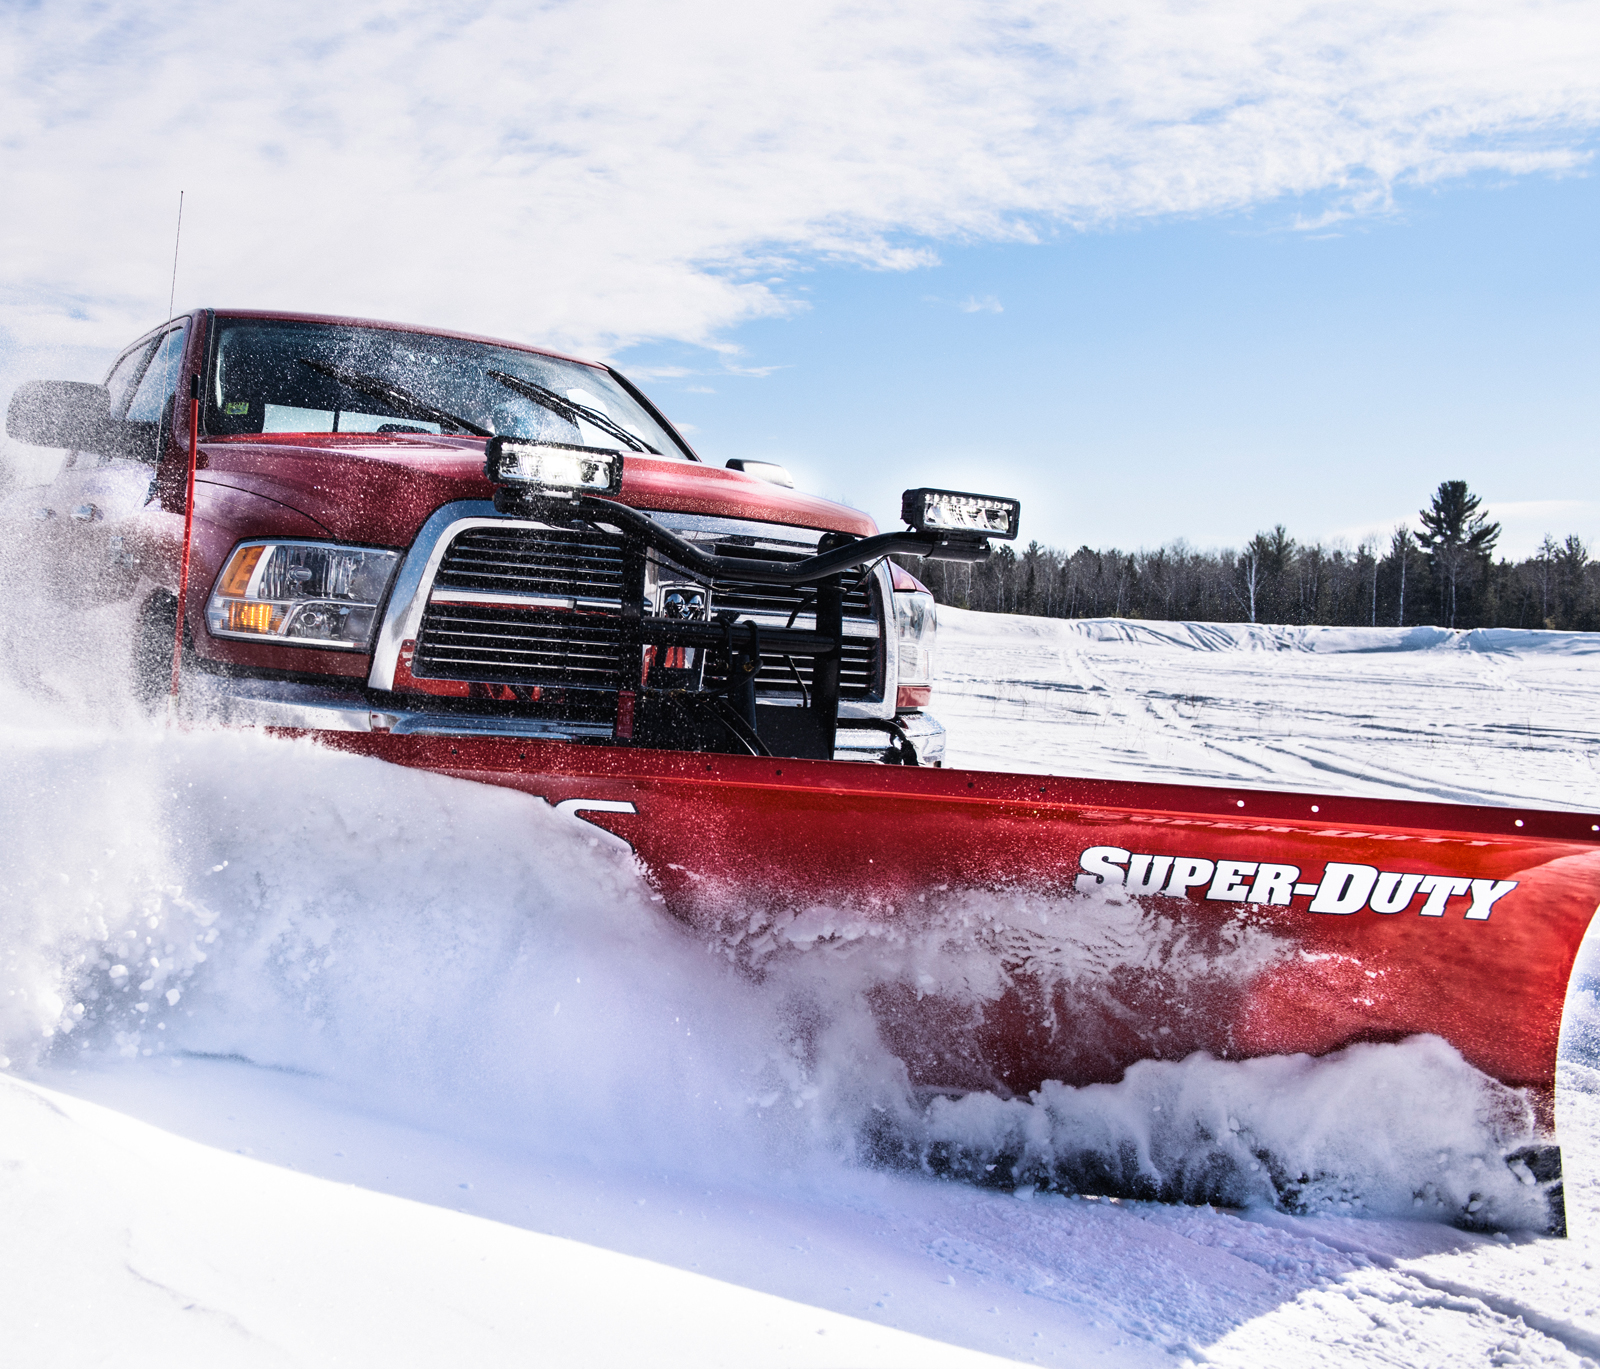 medium resolution of super duty plows boss snowplowboss snow plow wiring 02 chevy truck 17